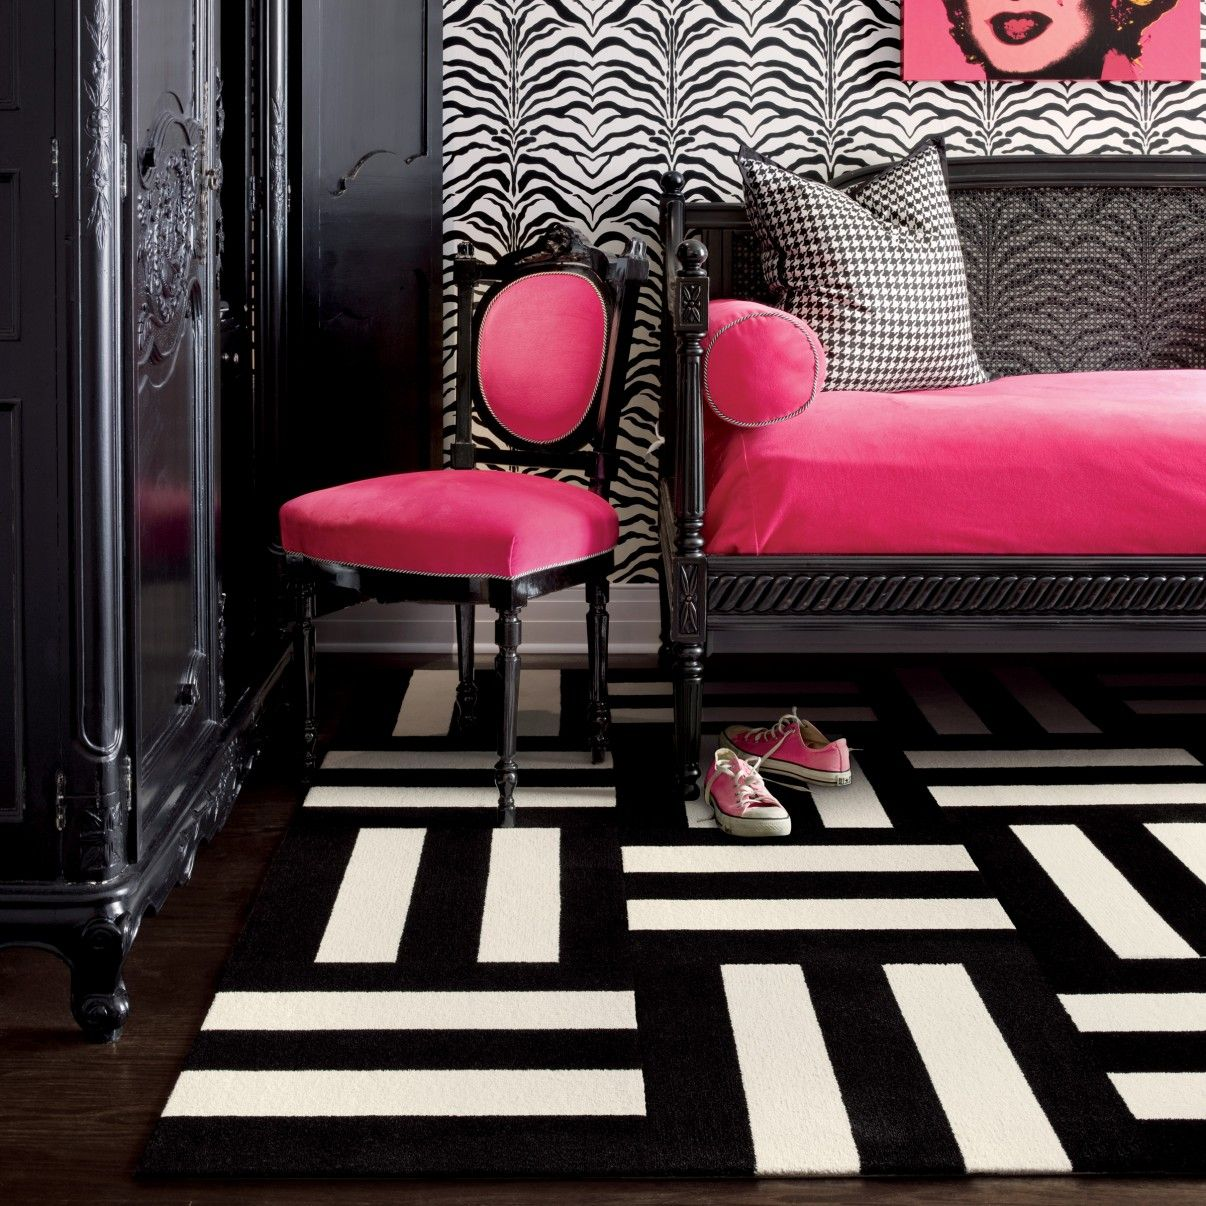 Pink And Black Bedroom Decor Pink And Black Bedrooms Purple Bedroom Wall Black Wooden Bed